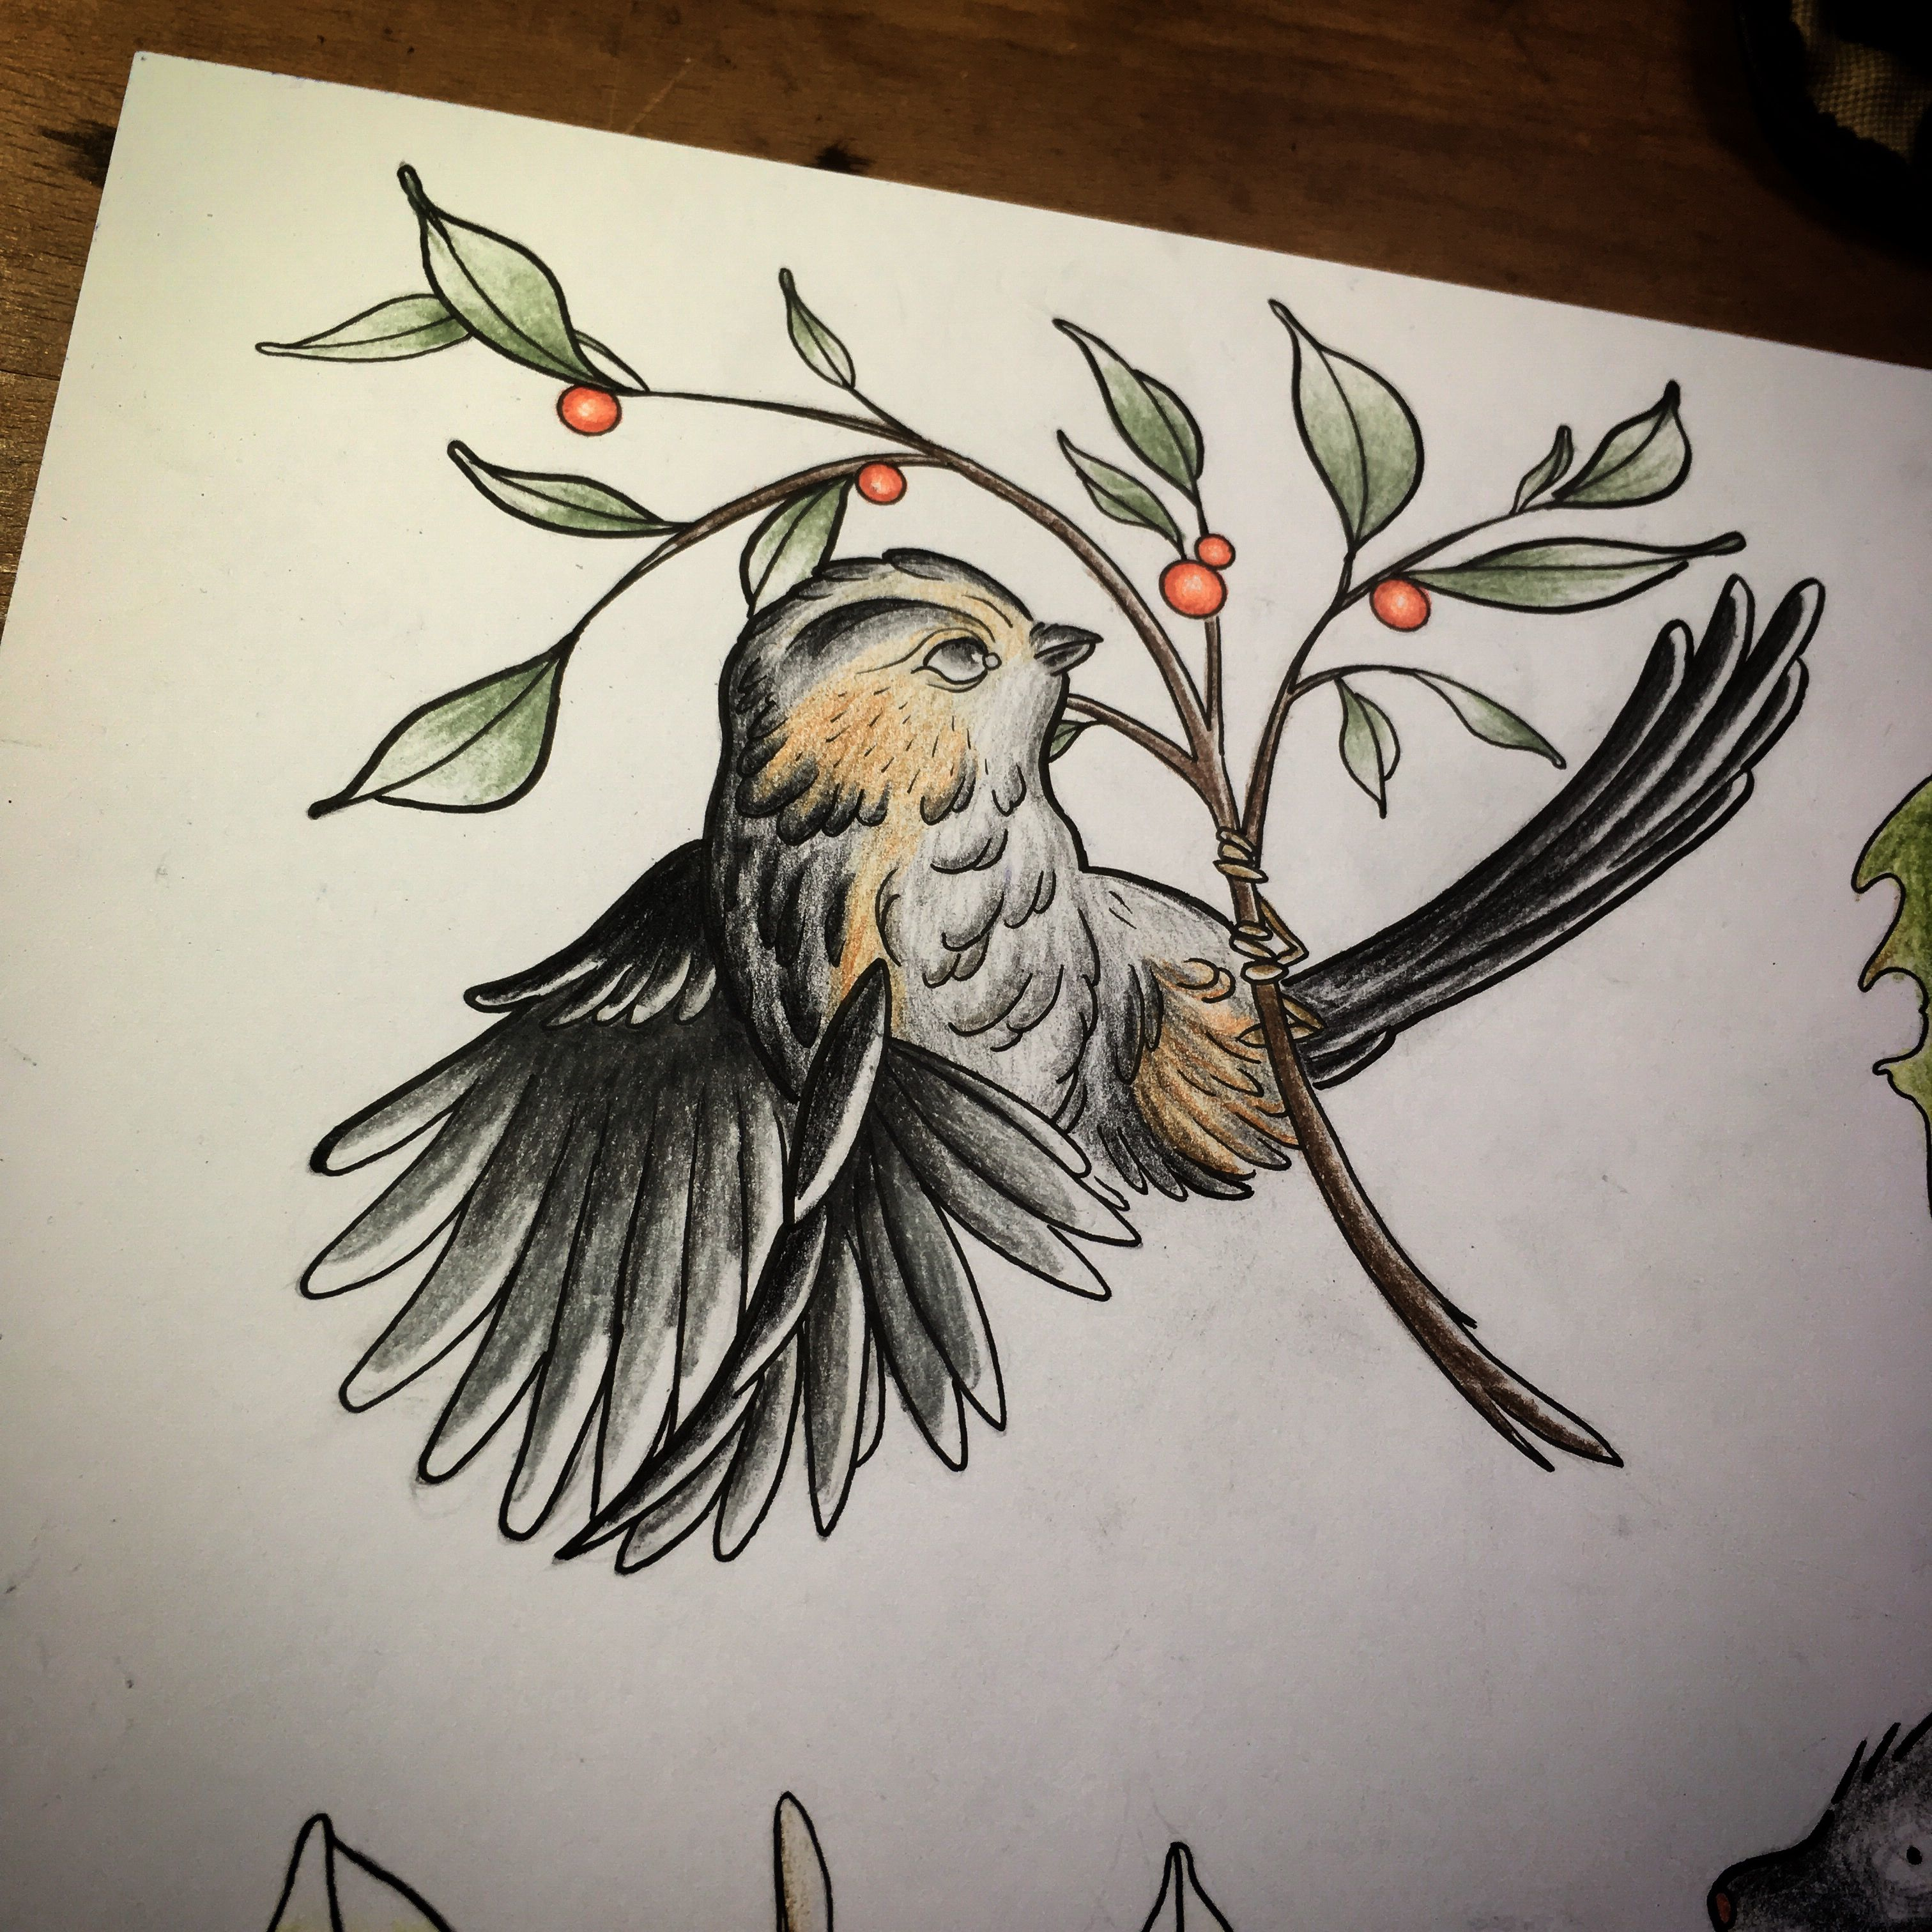 Flying Bird Bird Wings Berries Rembrandt Penicl Drawing Drawdaily Sketch Sketchbook Sketchaday Tattoo Flashset Ta Birds Flying Drawings Bird Wings